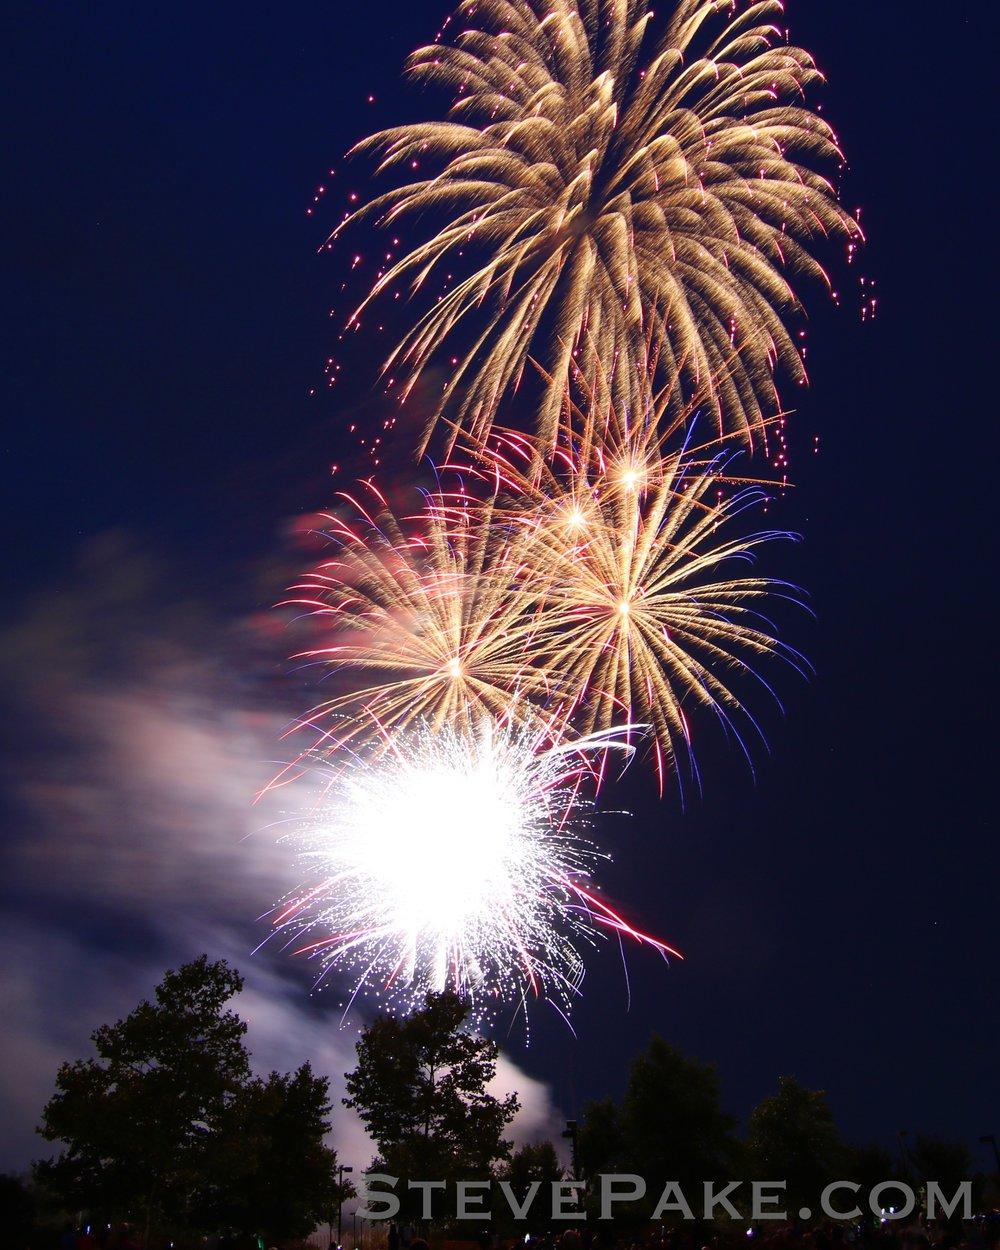 Fireworks2018_26_GE3A8540ap-HD-WM.jpg